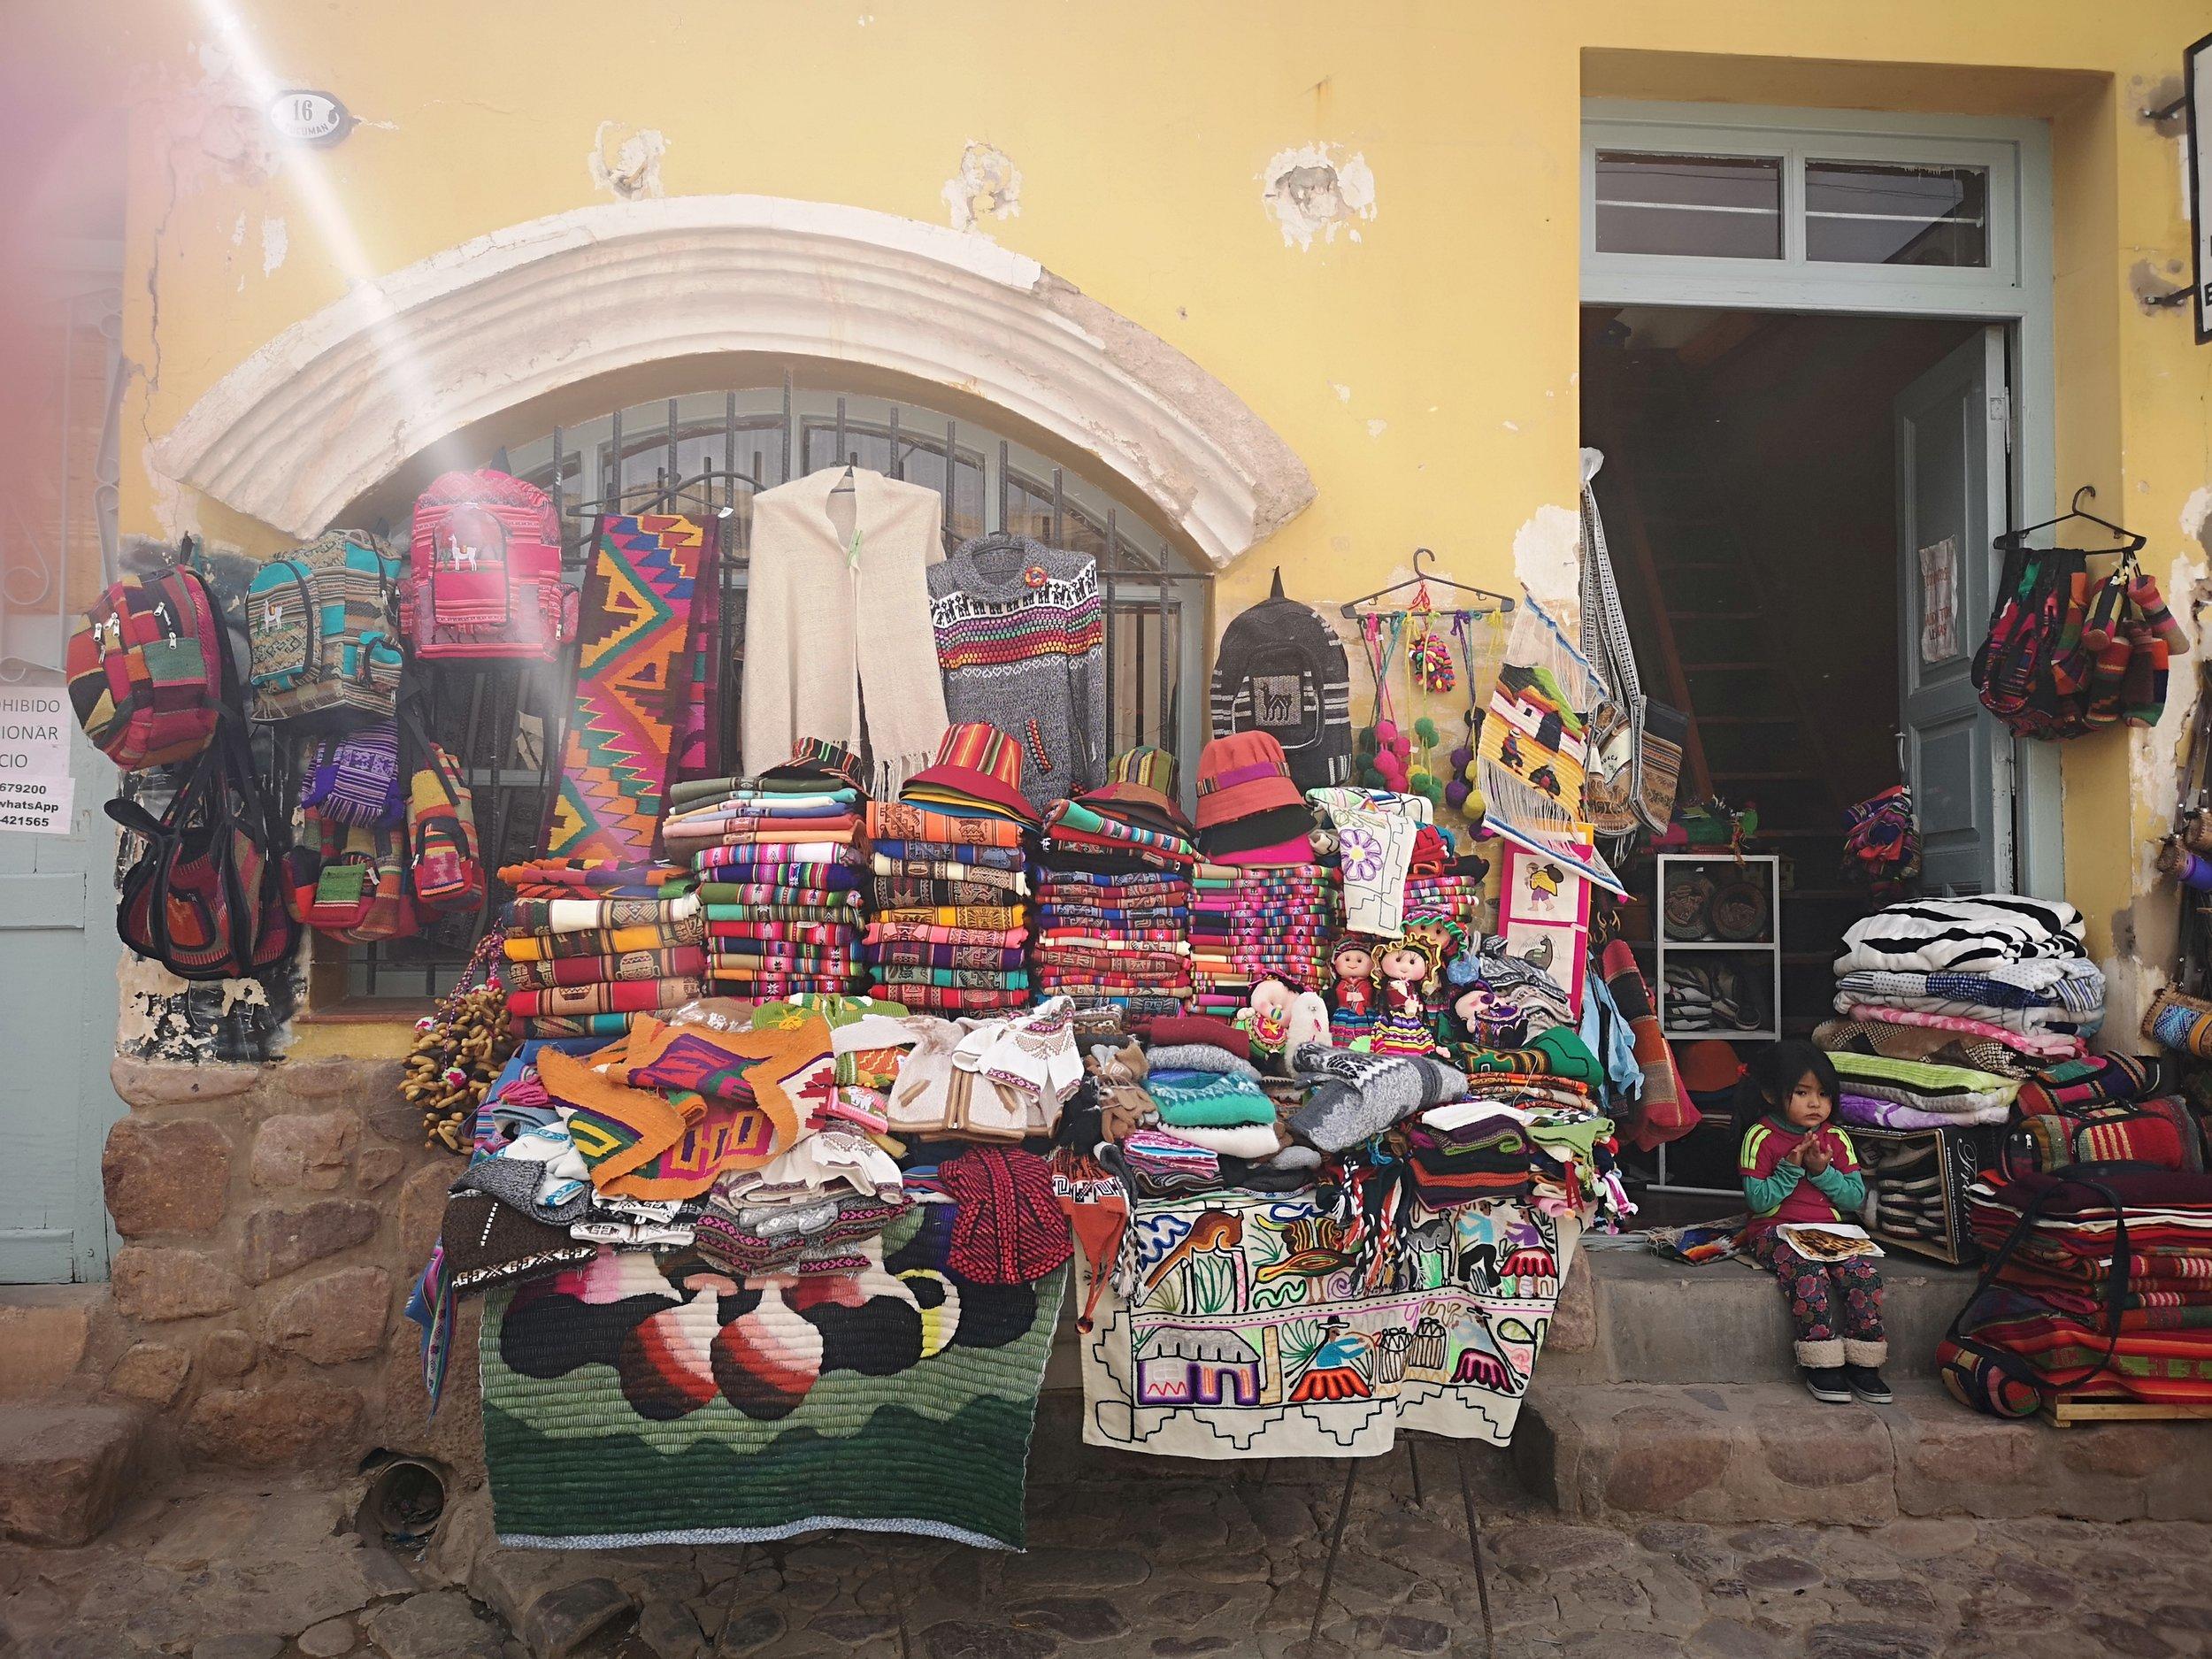 17.Humahuaca Market stall - The Grown Up Edit.jpg